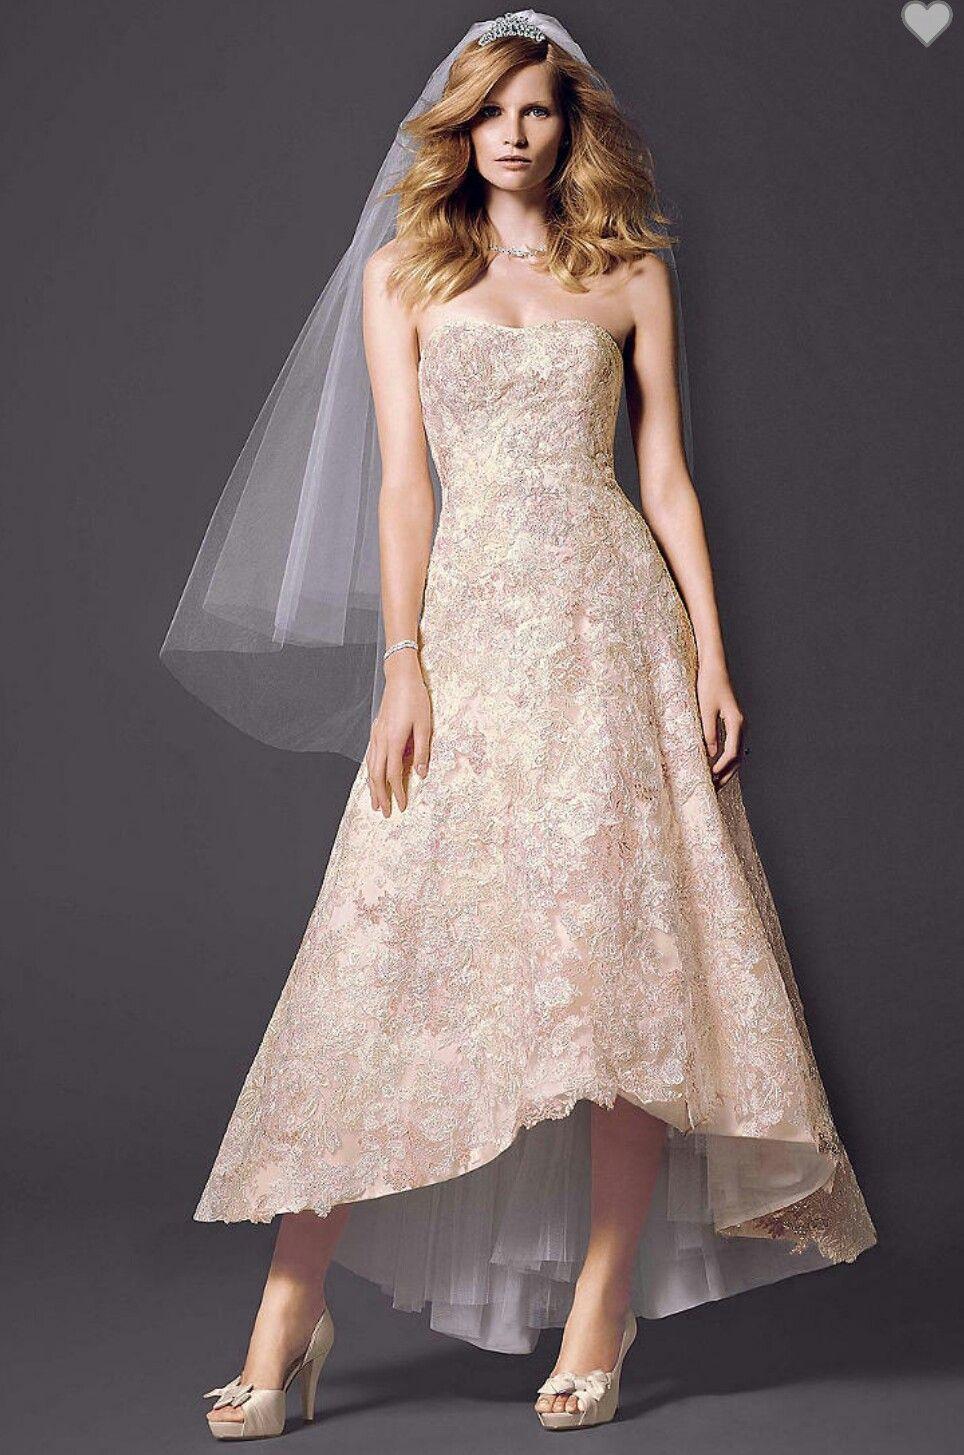 Pin by Alyssa on Wedding dresses | Short wedding dress ...